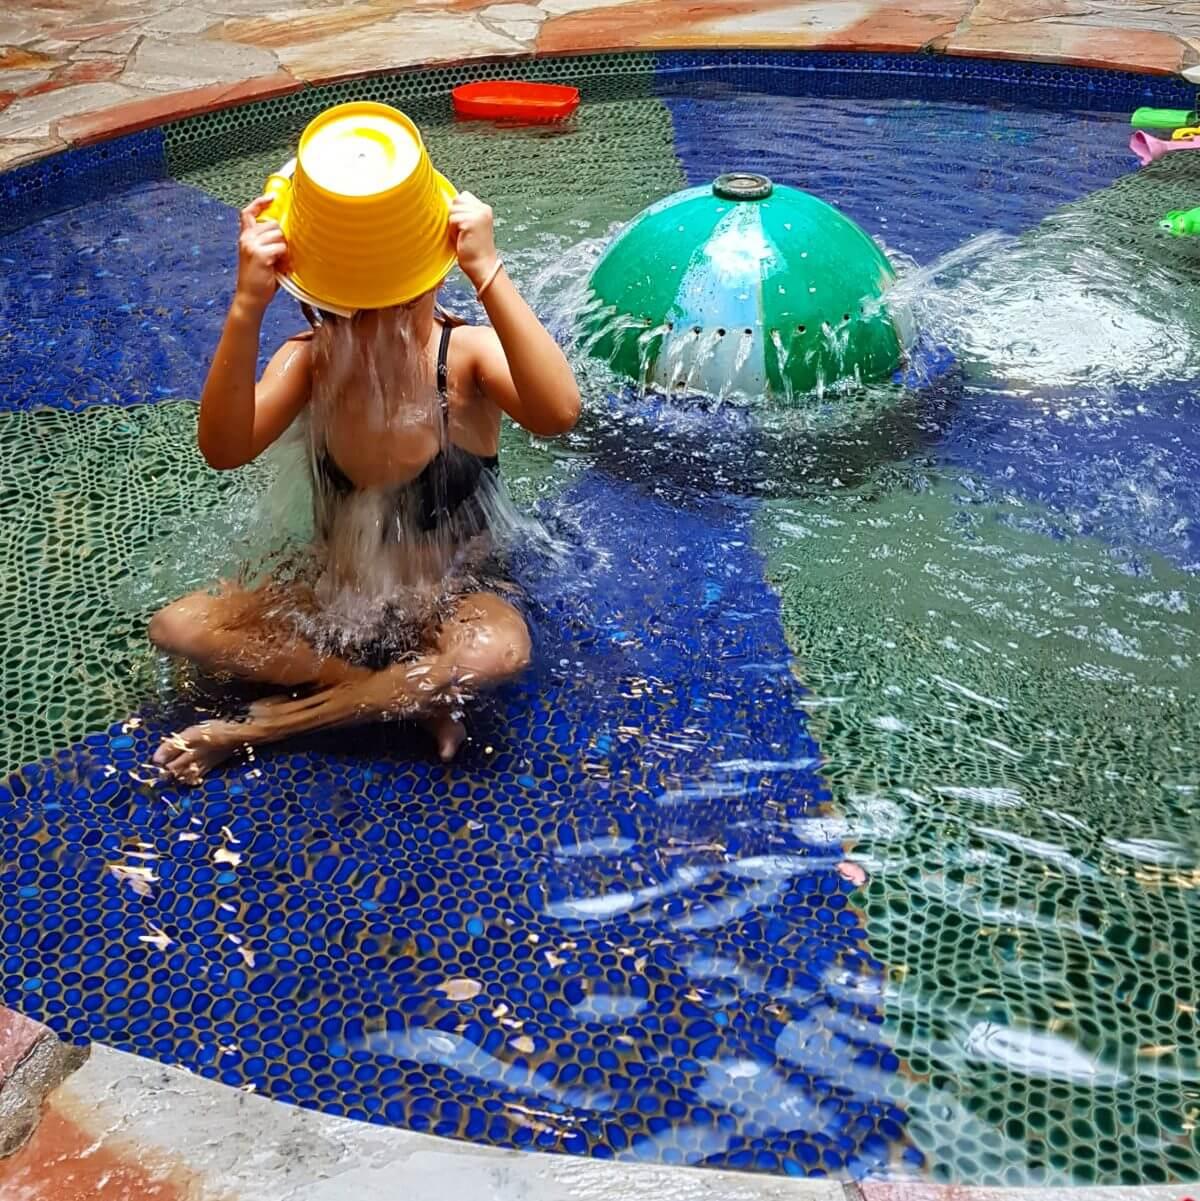 Binnenzwembad in Vakantiepark Dierenbos